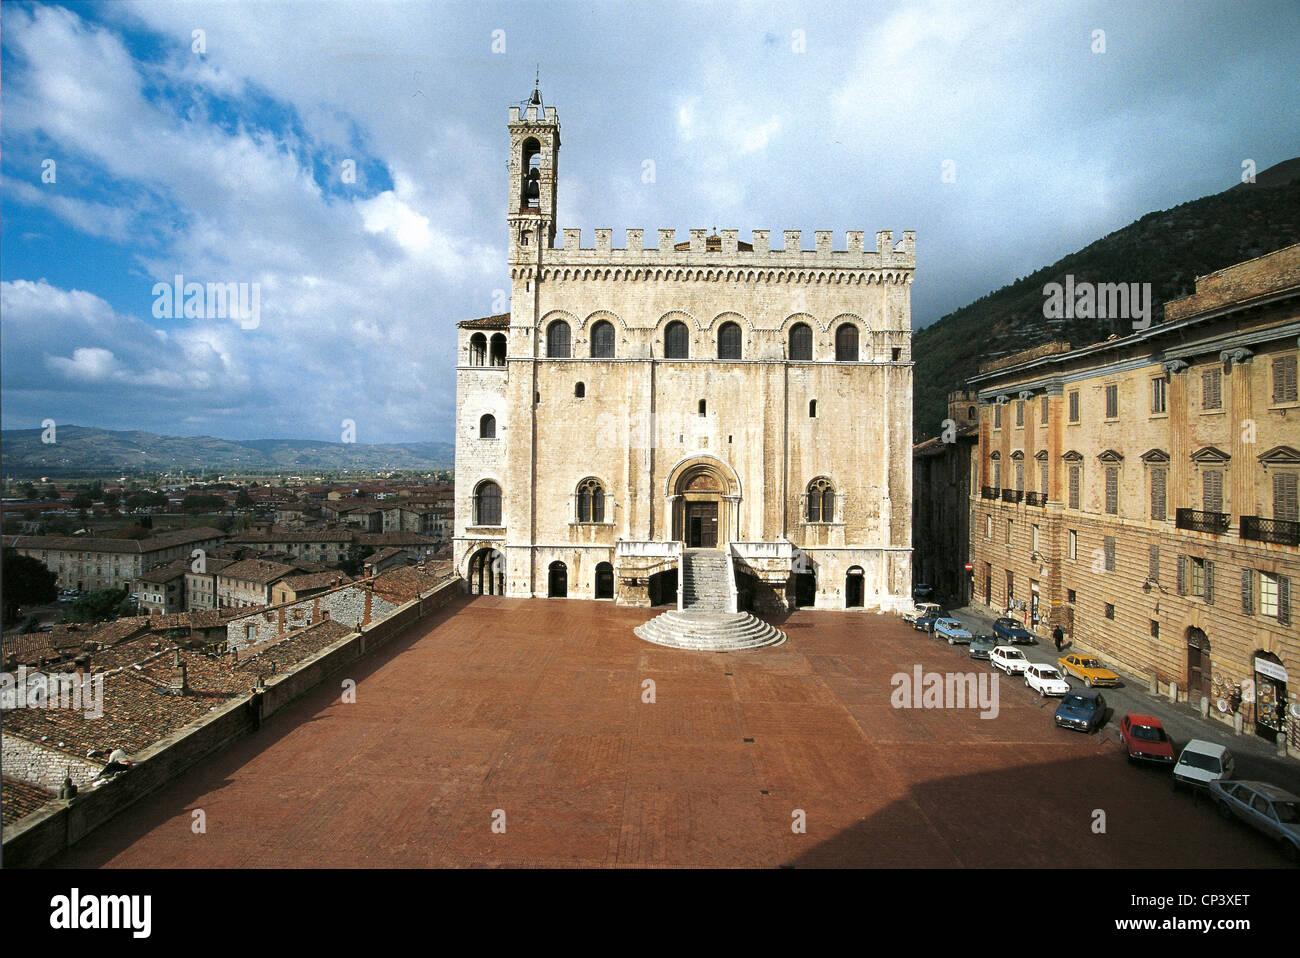 Umbria Gubbio (Pg). Palazzo dei Consoli, built in first half of fourteenth century designed by Angelo da Orvieto. - Stock Image